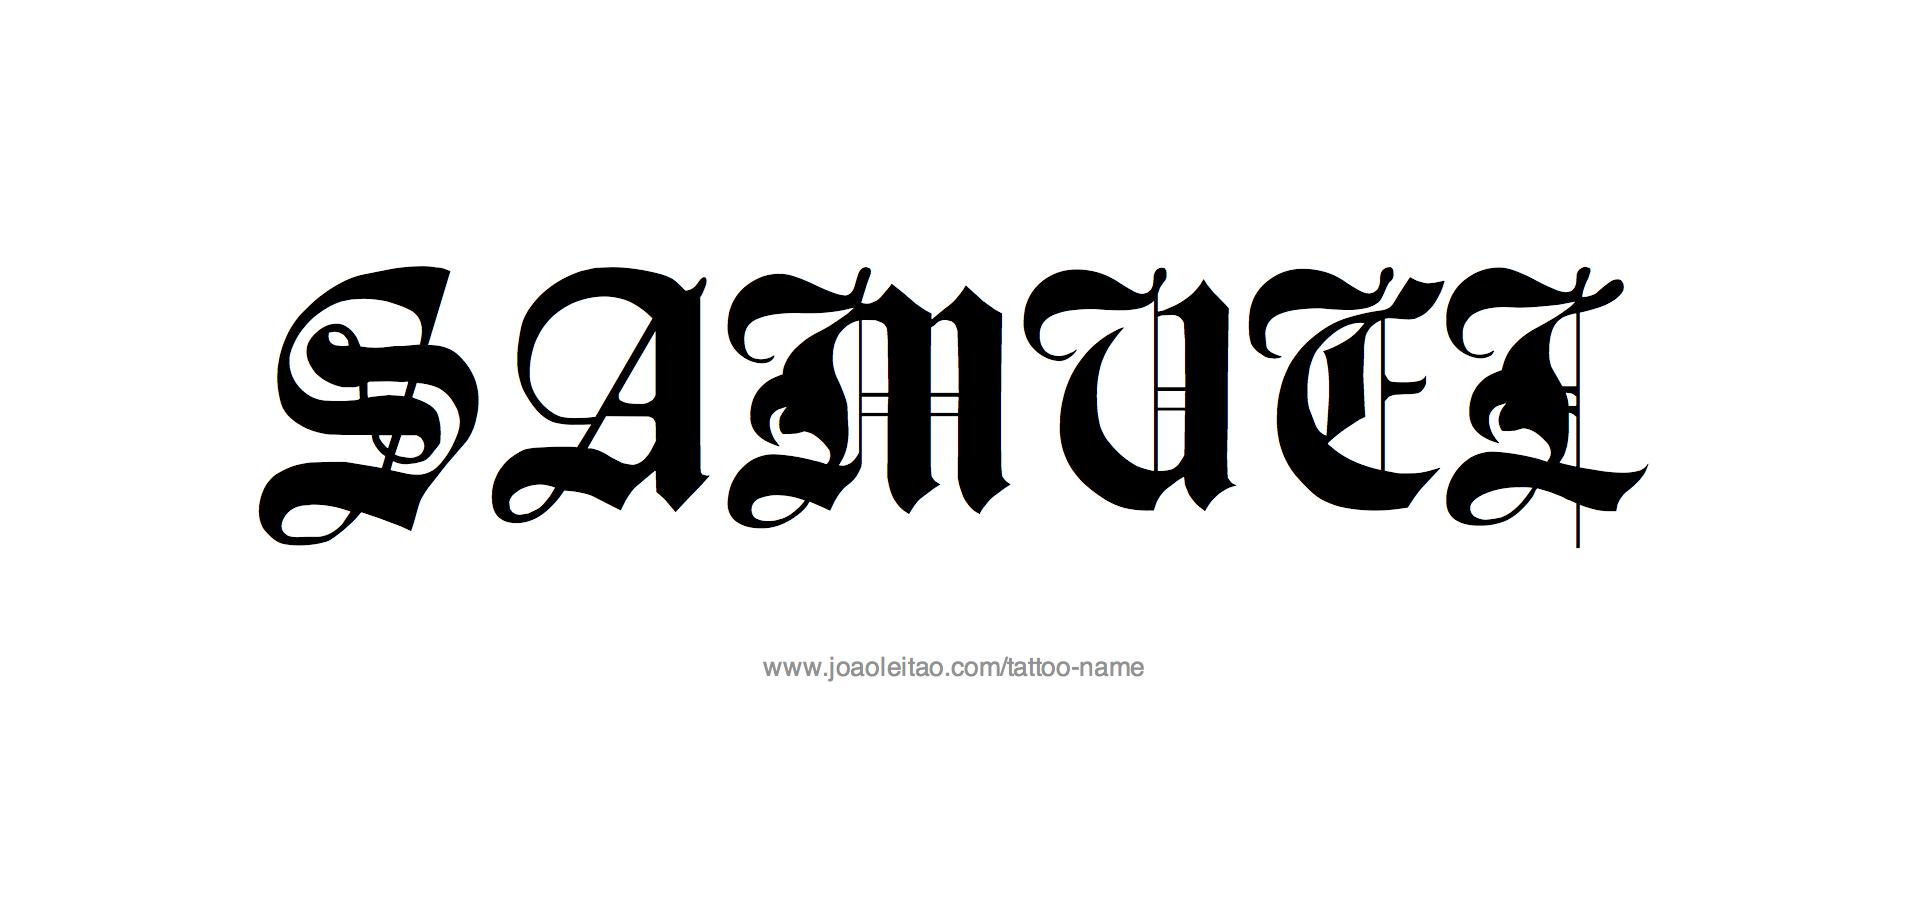 Samuel Name Tattoo Designs